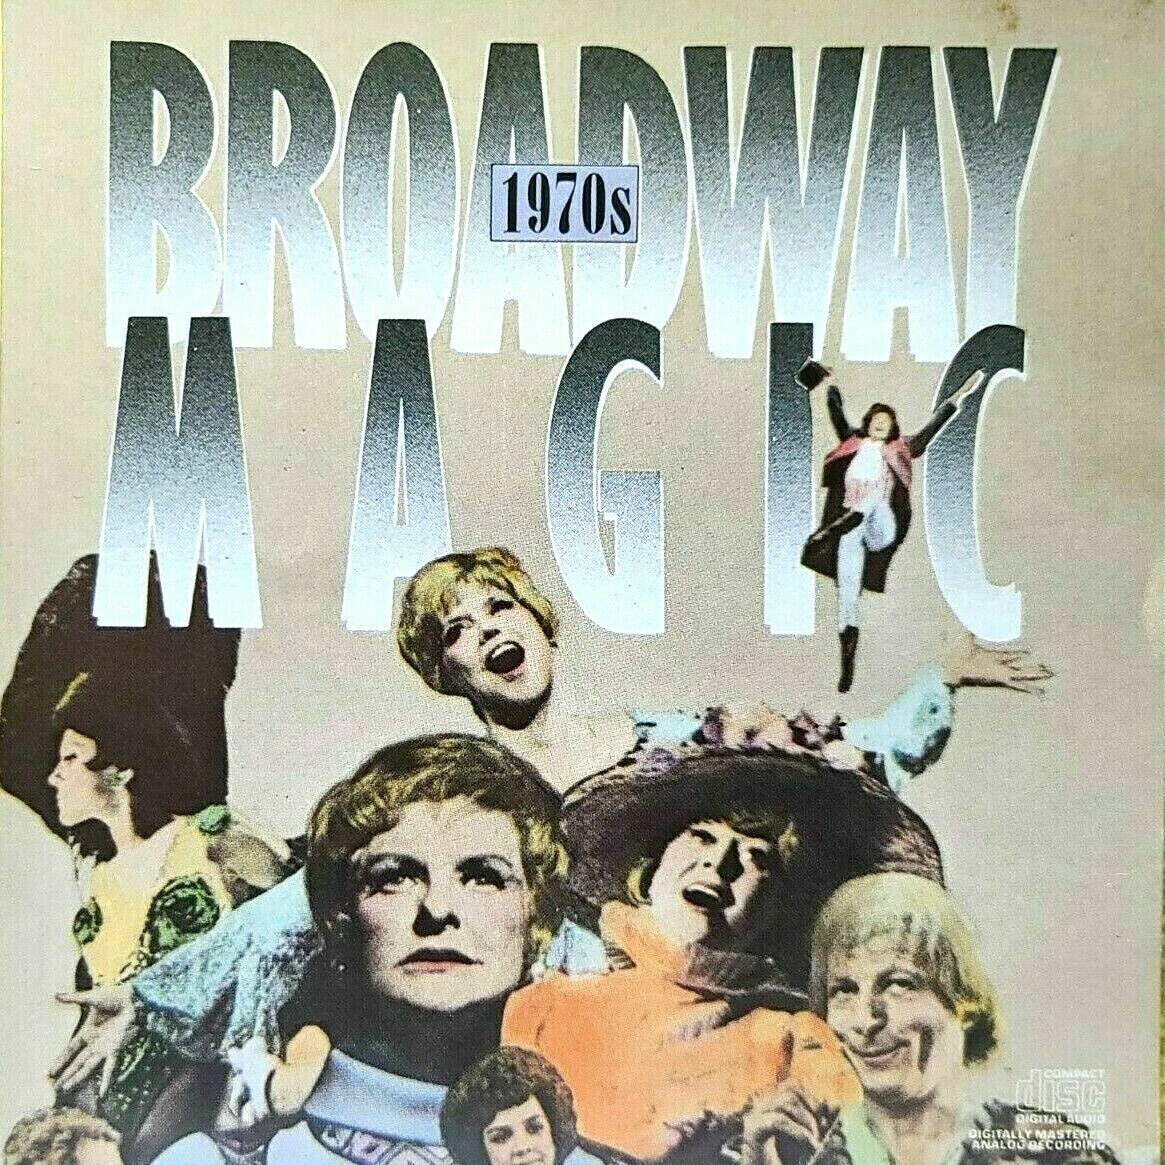 Broadway Magic 1970s Original Cast Compilation - Audio CD - VERY GOOD - $7.99